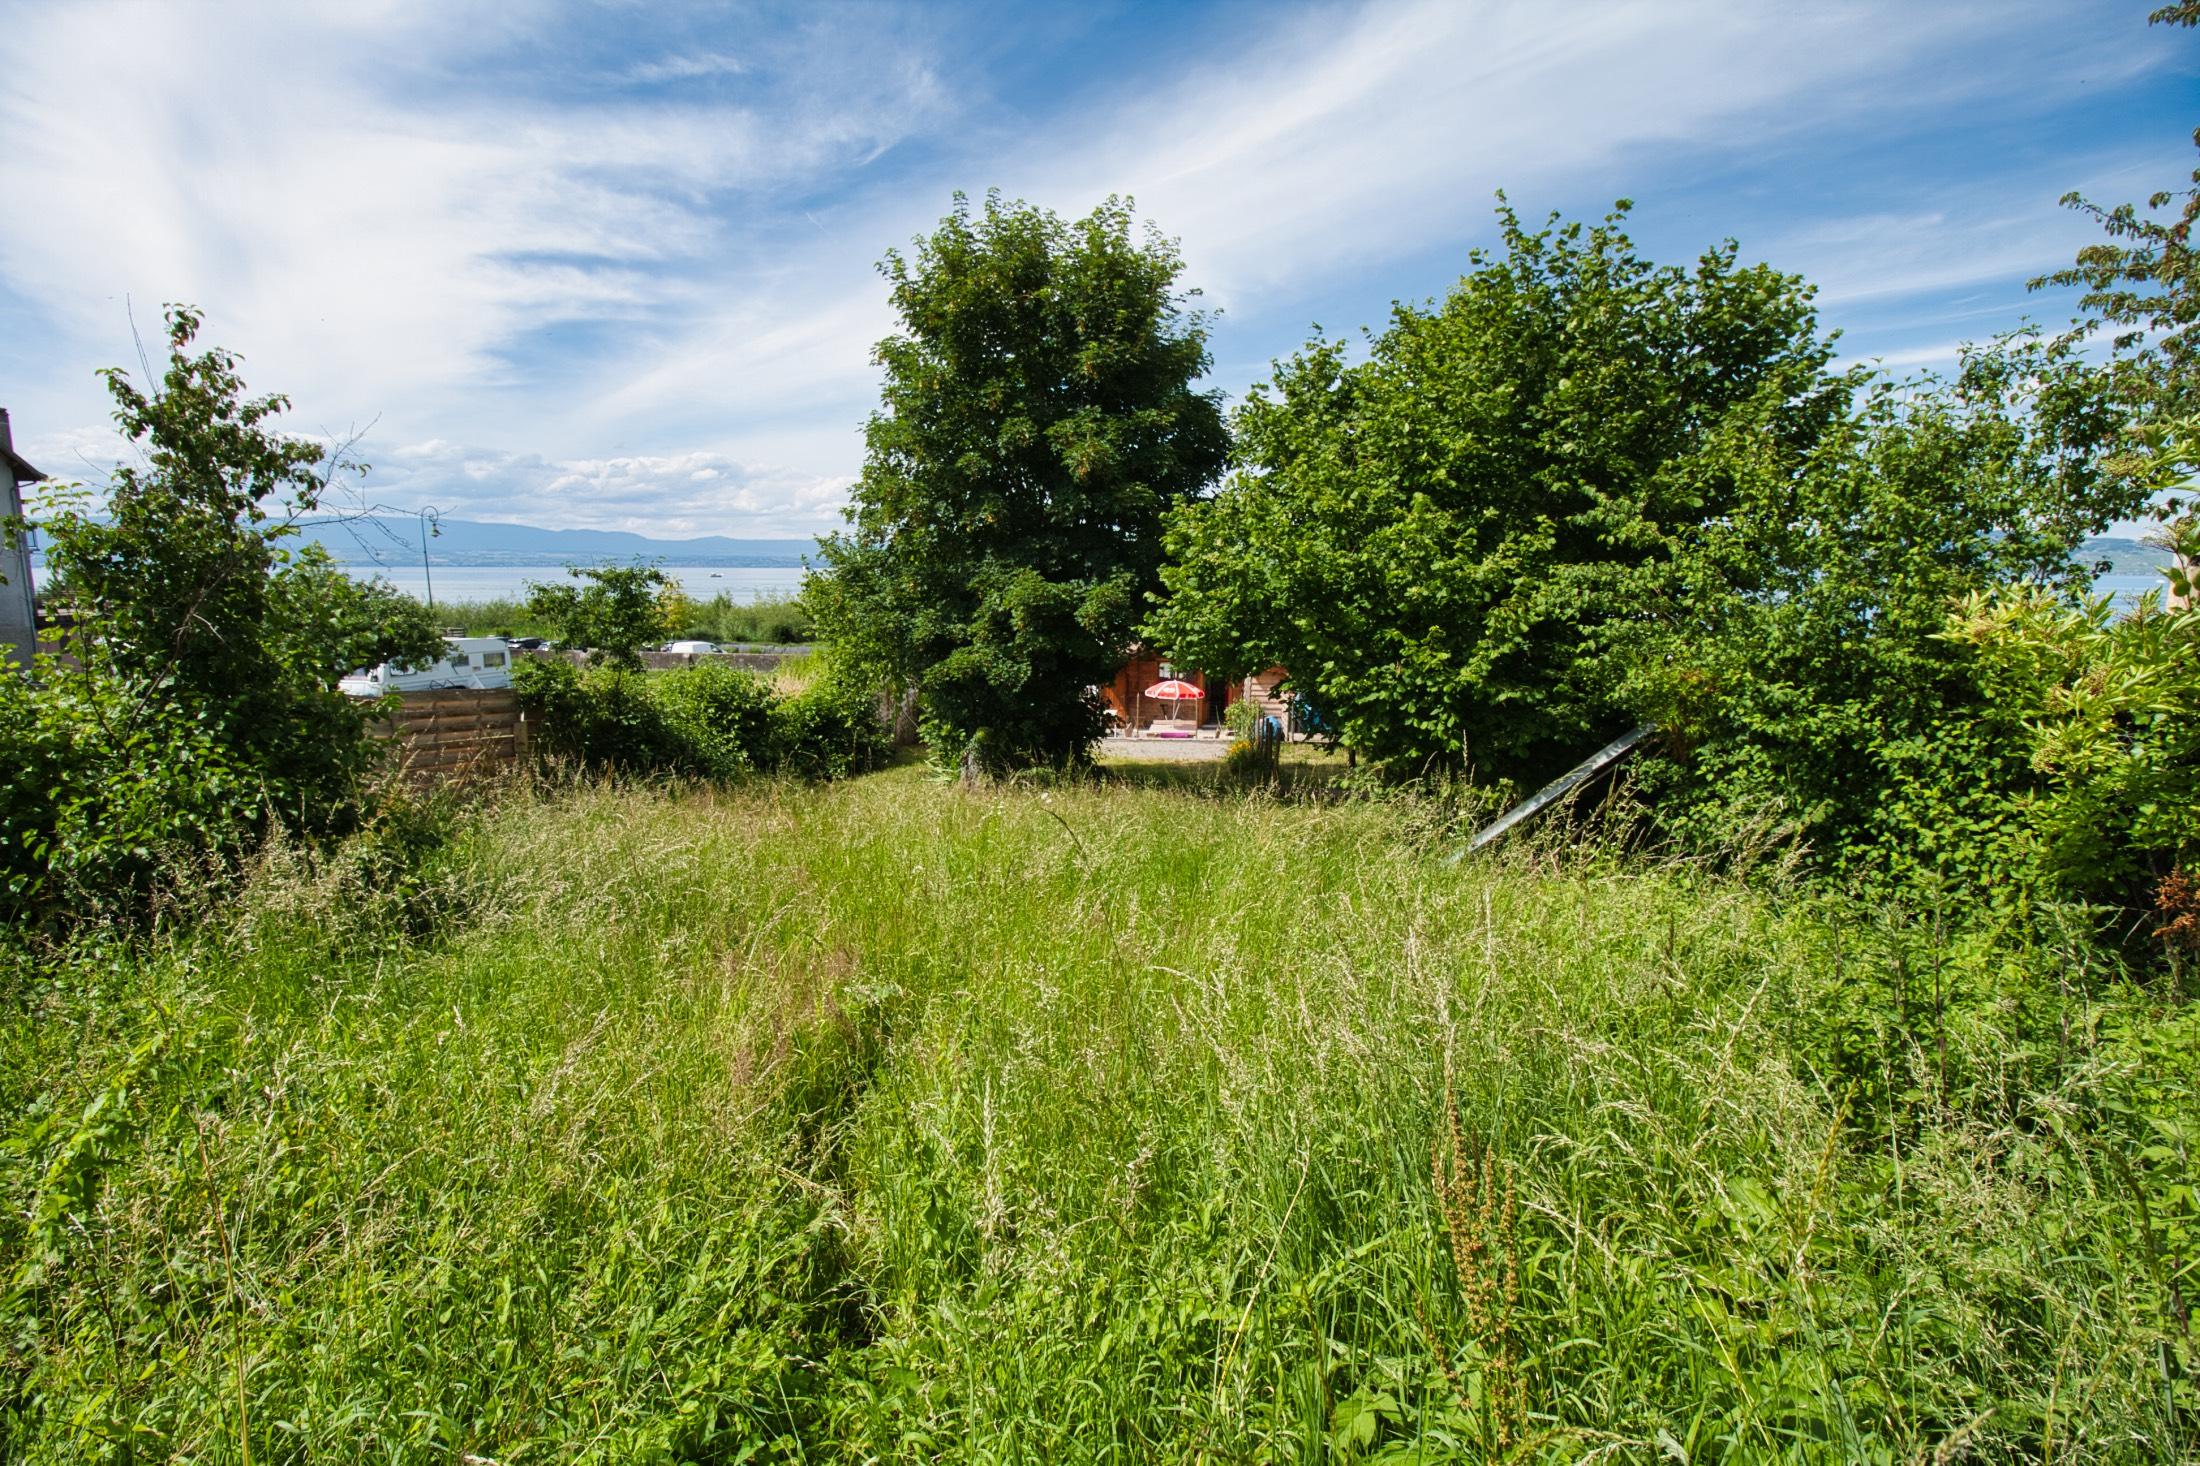 участок под застройку женевское озеро франция эвиан